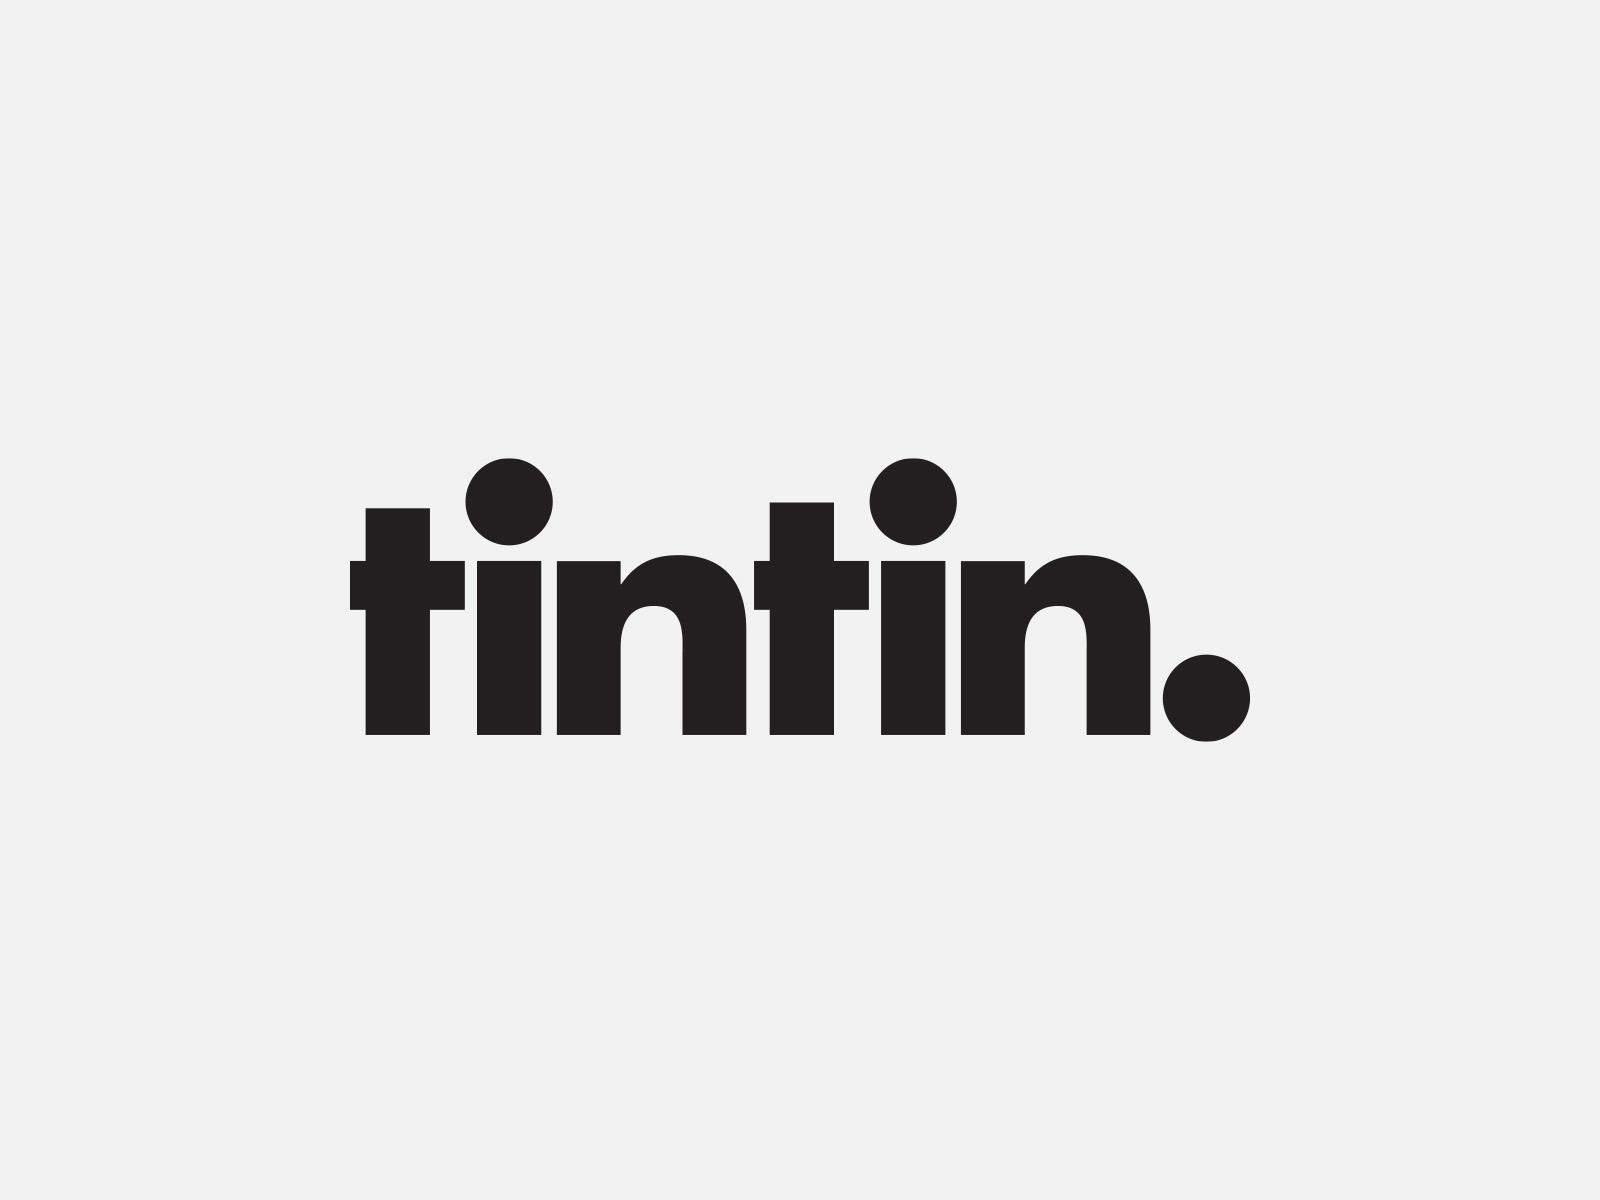 Tintin Can Company by Leo Burnett Design